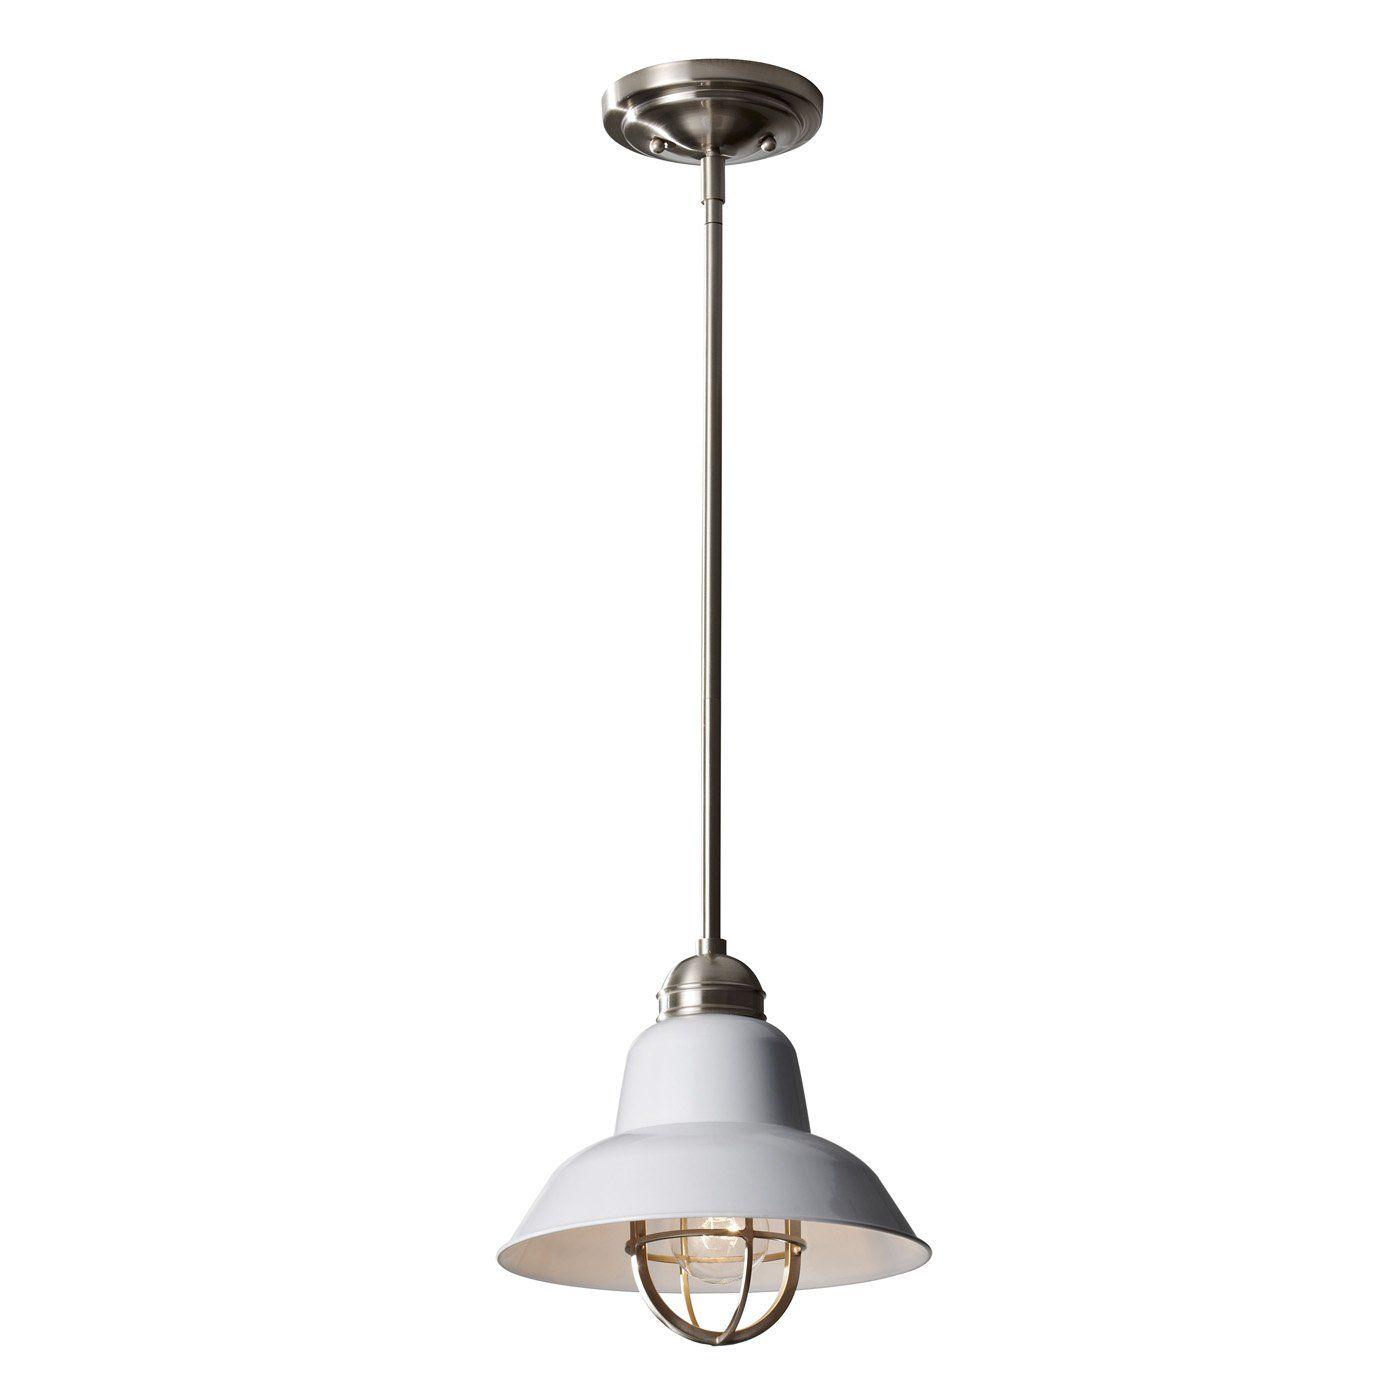 Murray feiss pbsgw urban renewal mini pendant lighting